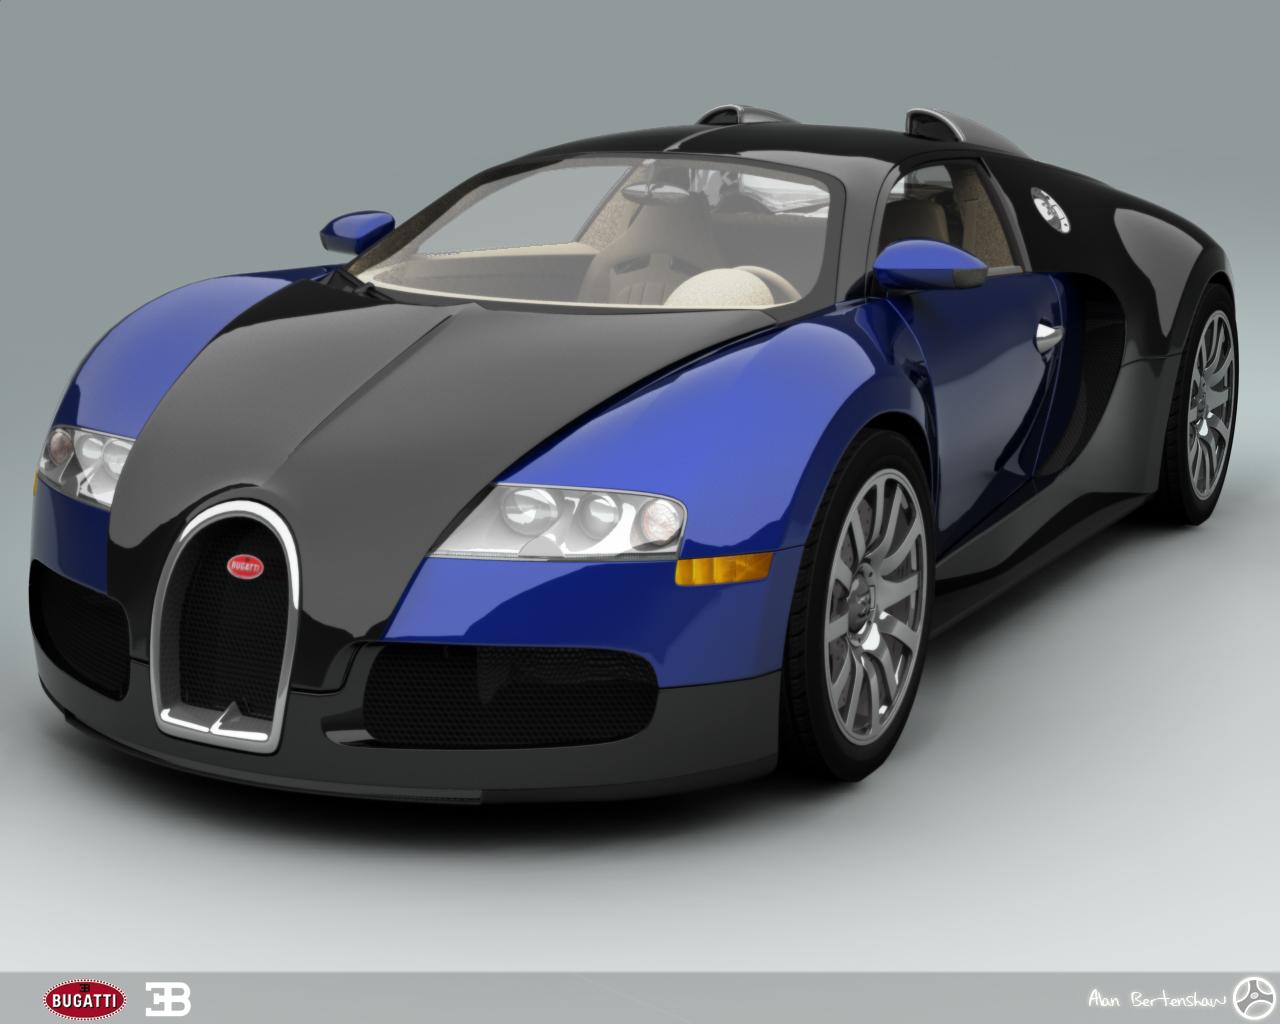 Bugatti Veyron Car Price In India